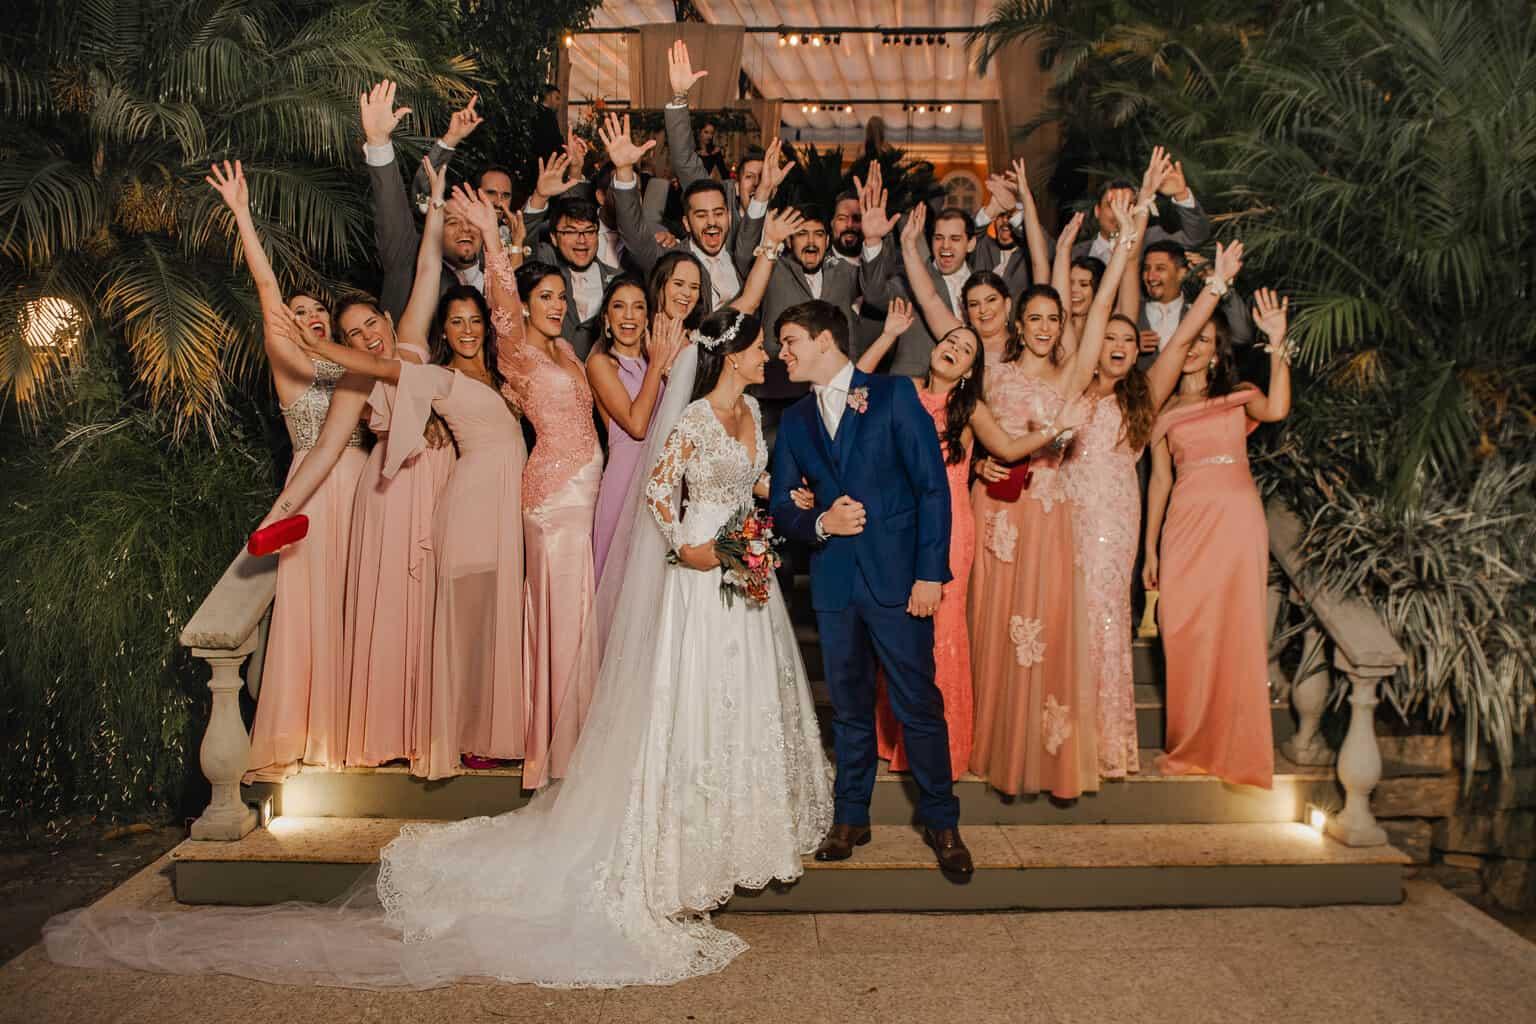 casamento-Beatriz-e-Joao-Fernando-Itaipava-Locanda-Della-Mimosa-padrinhos-Thienny-Tammis182